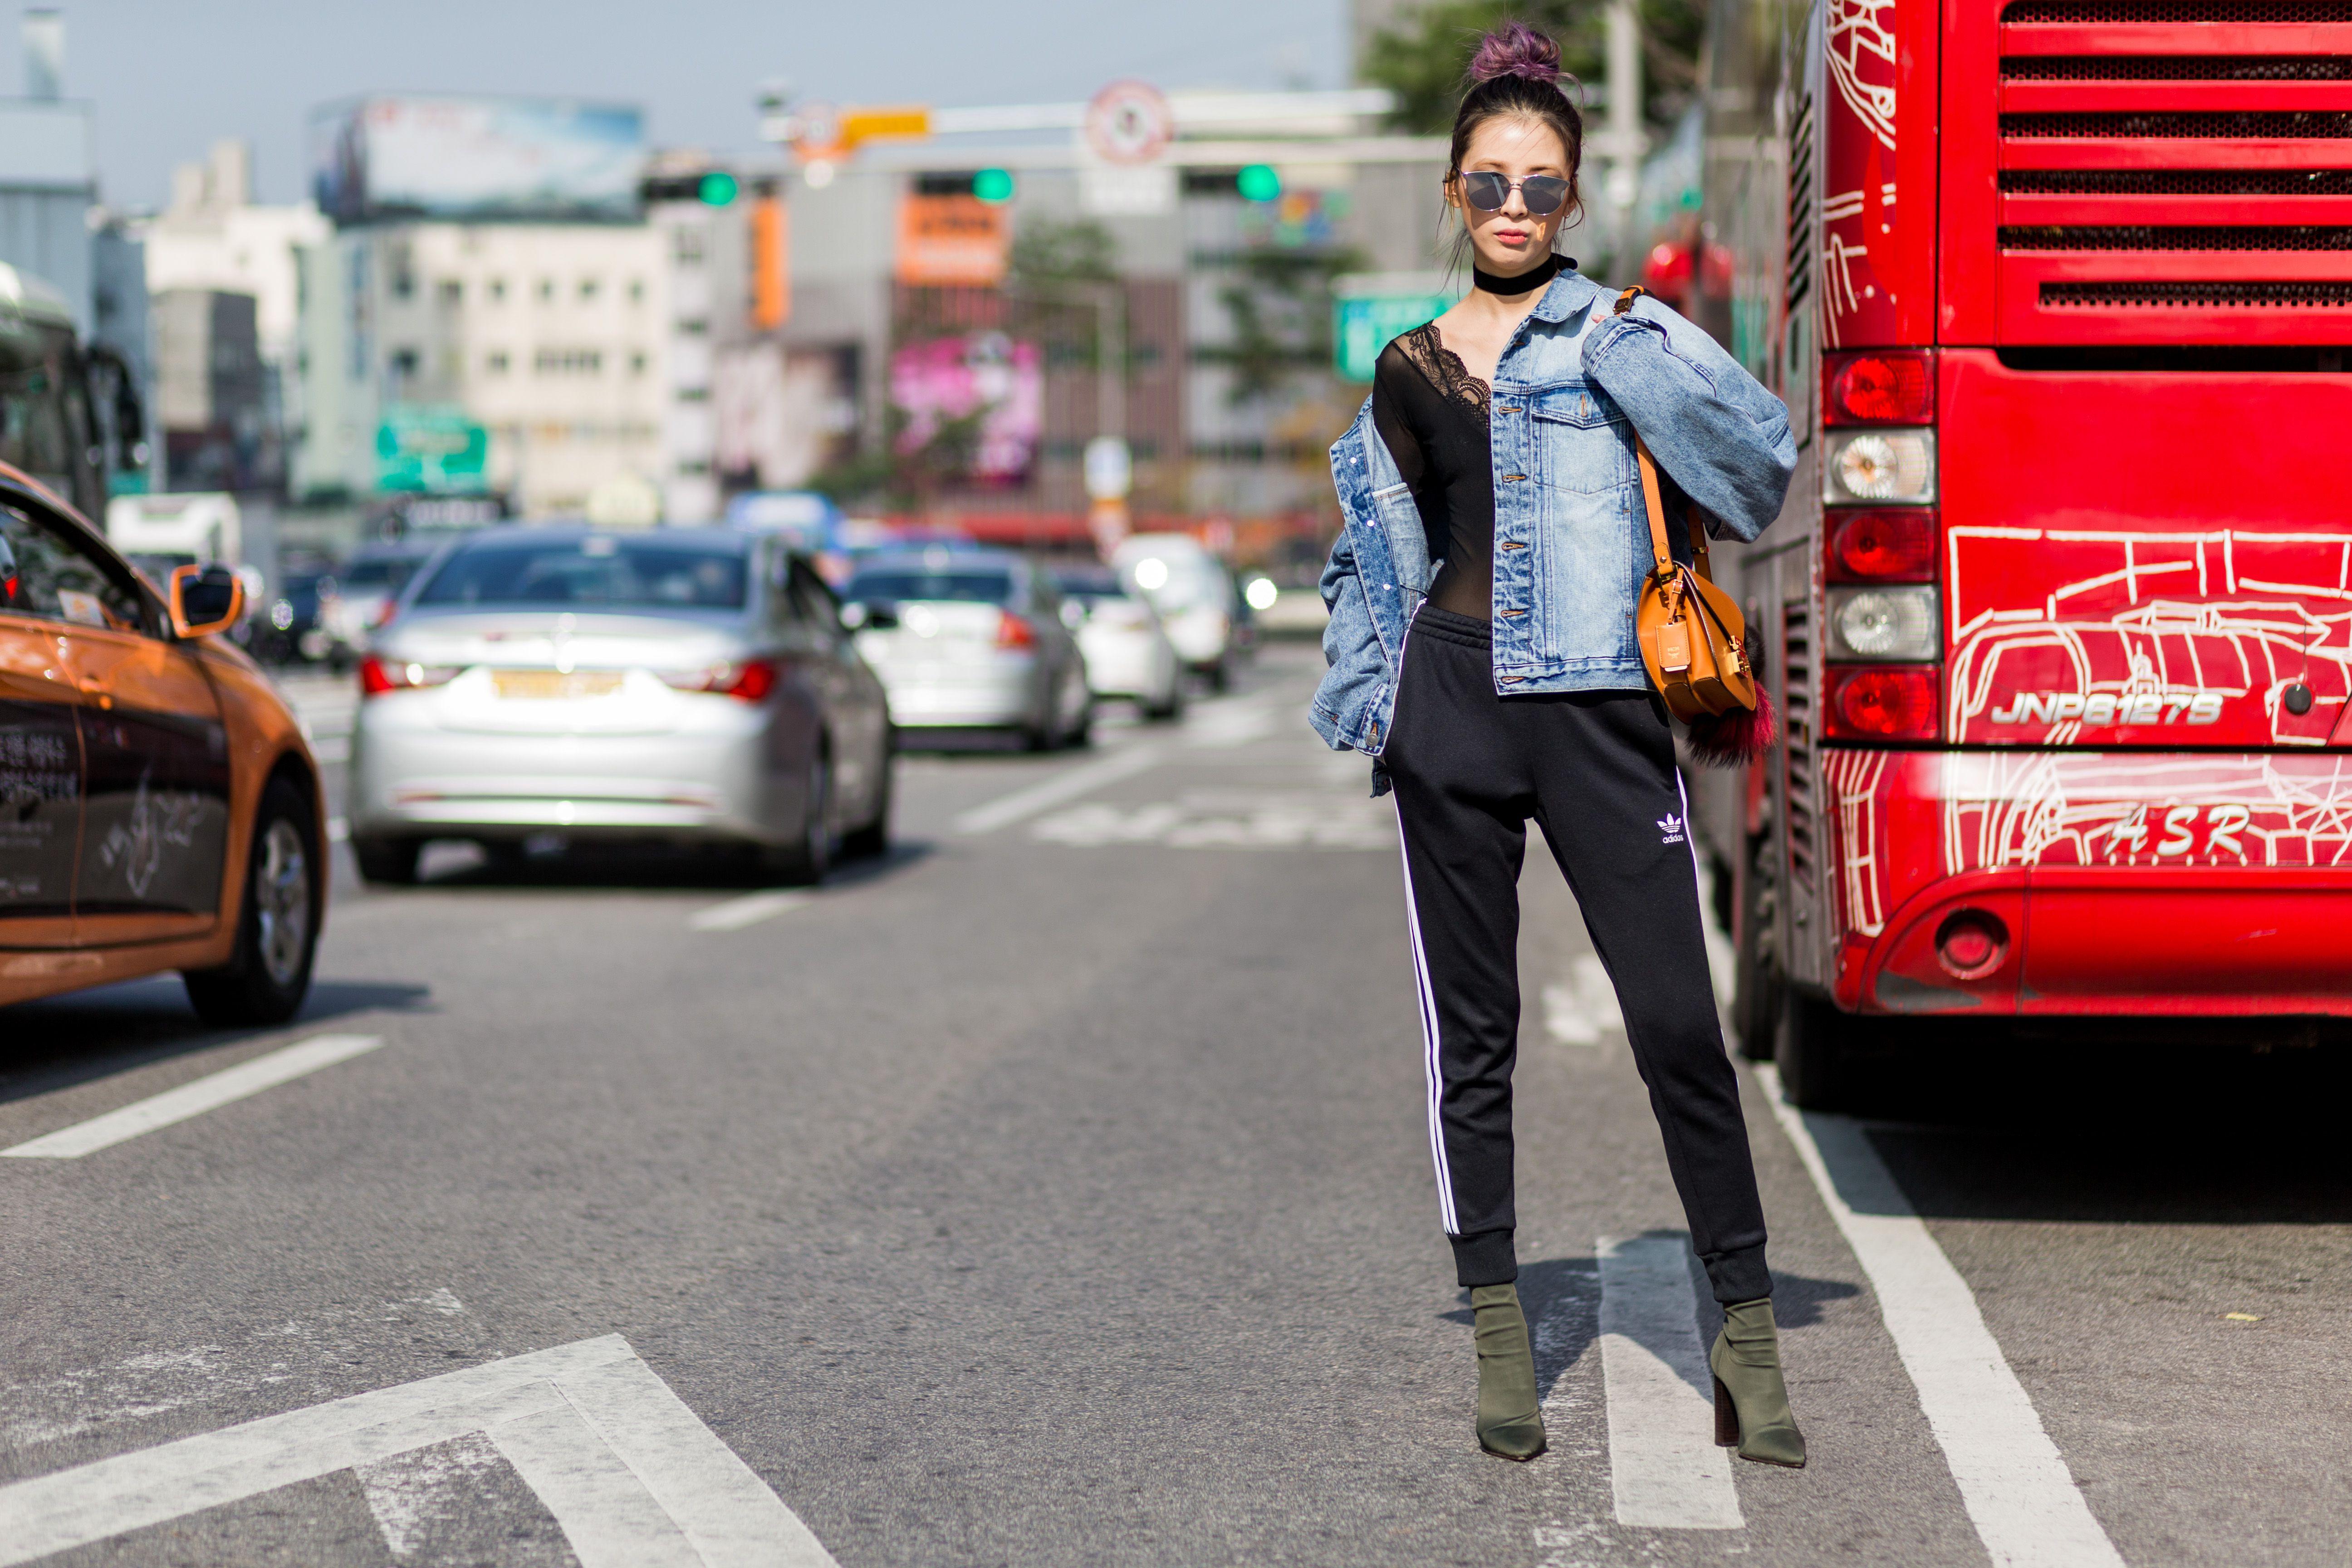 Irene Kim posing in a city street